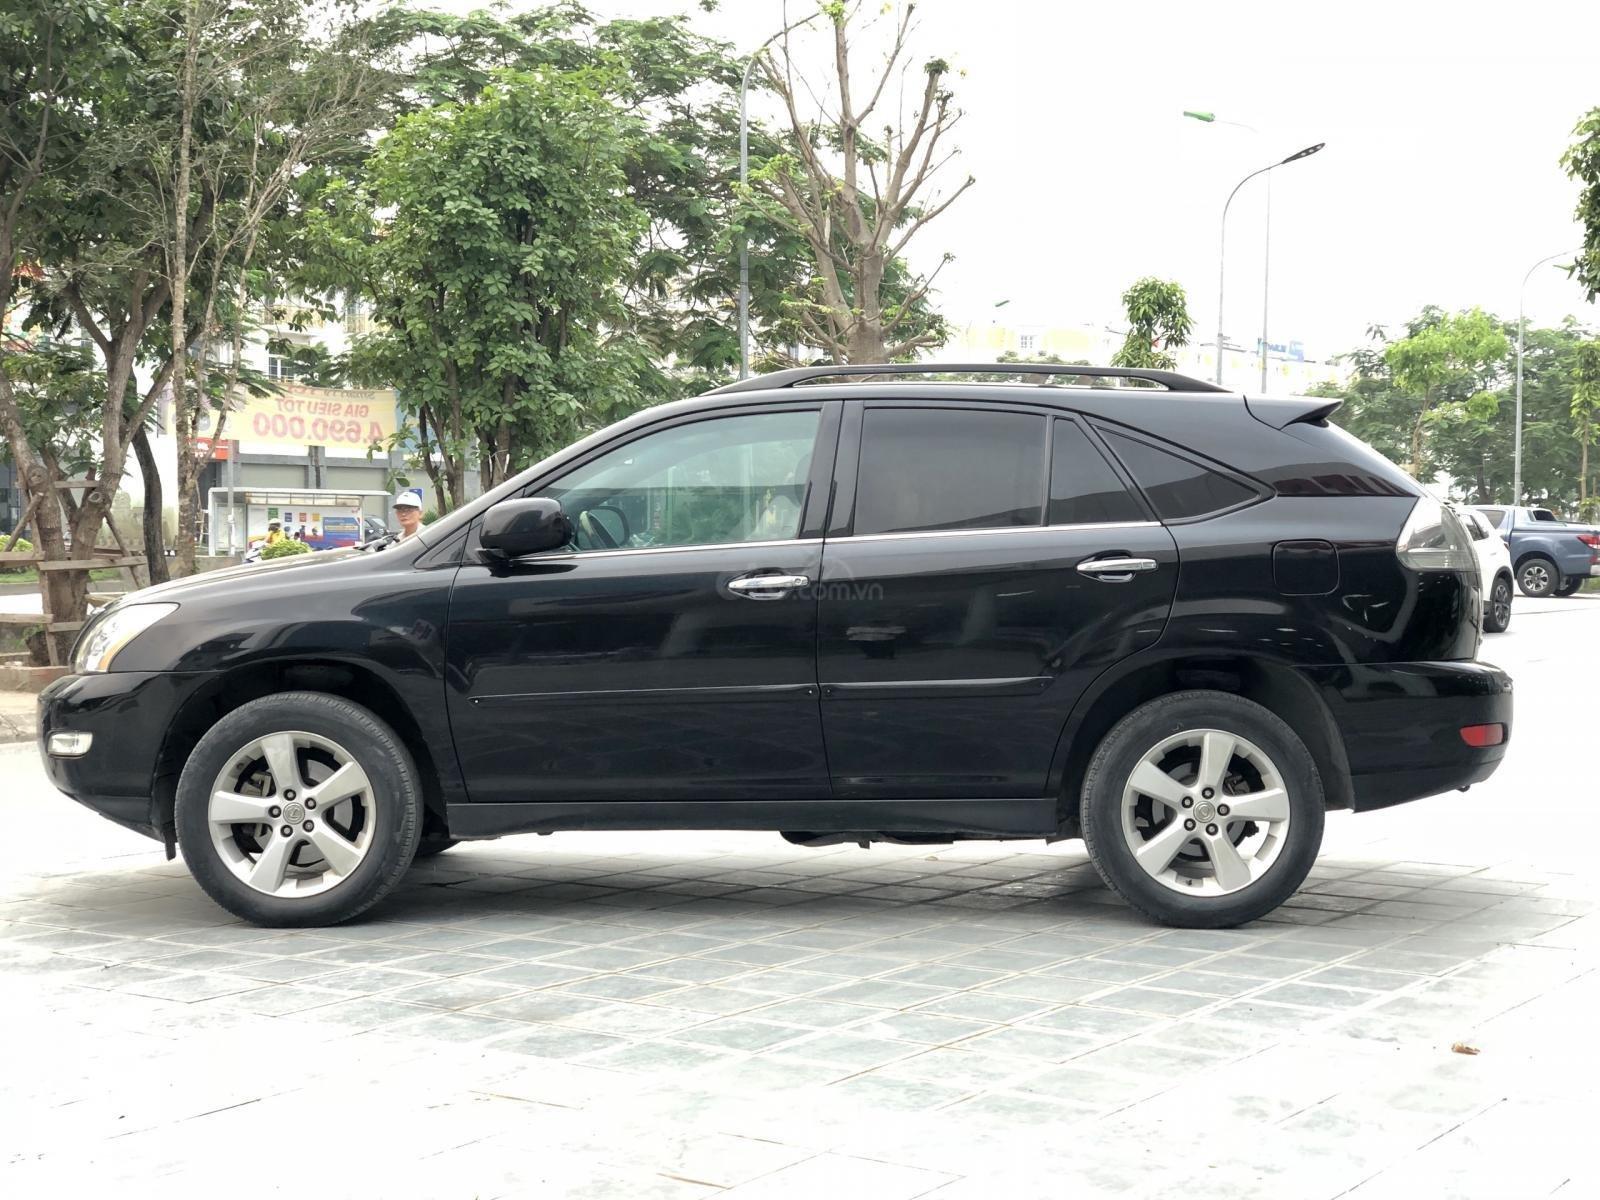 MT Auto bán Lexus RX 350 năm 2007, màu đen, xe nhập khẩu. LH em Hương 0945392468-6